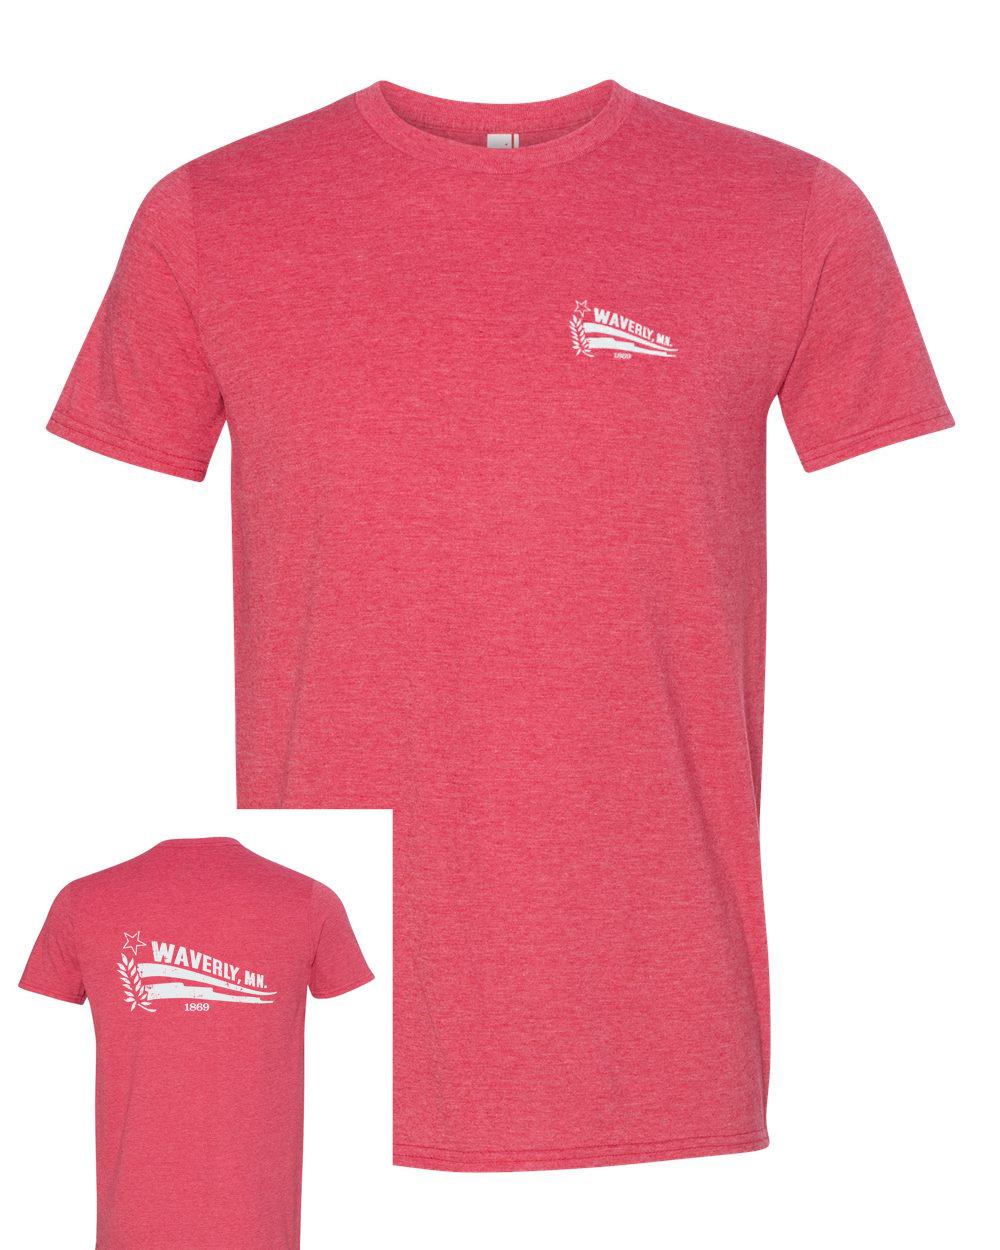 Waverly, MN 1869 Hometown T-Shirt or Hoodie CHOOSE YOUR SHIRT!